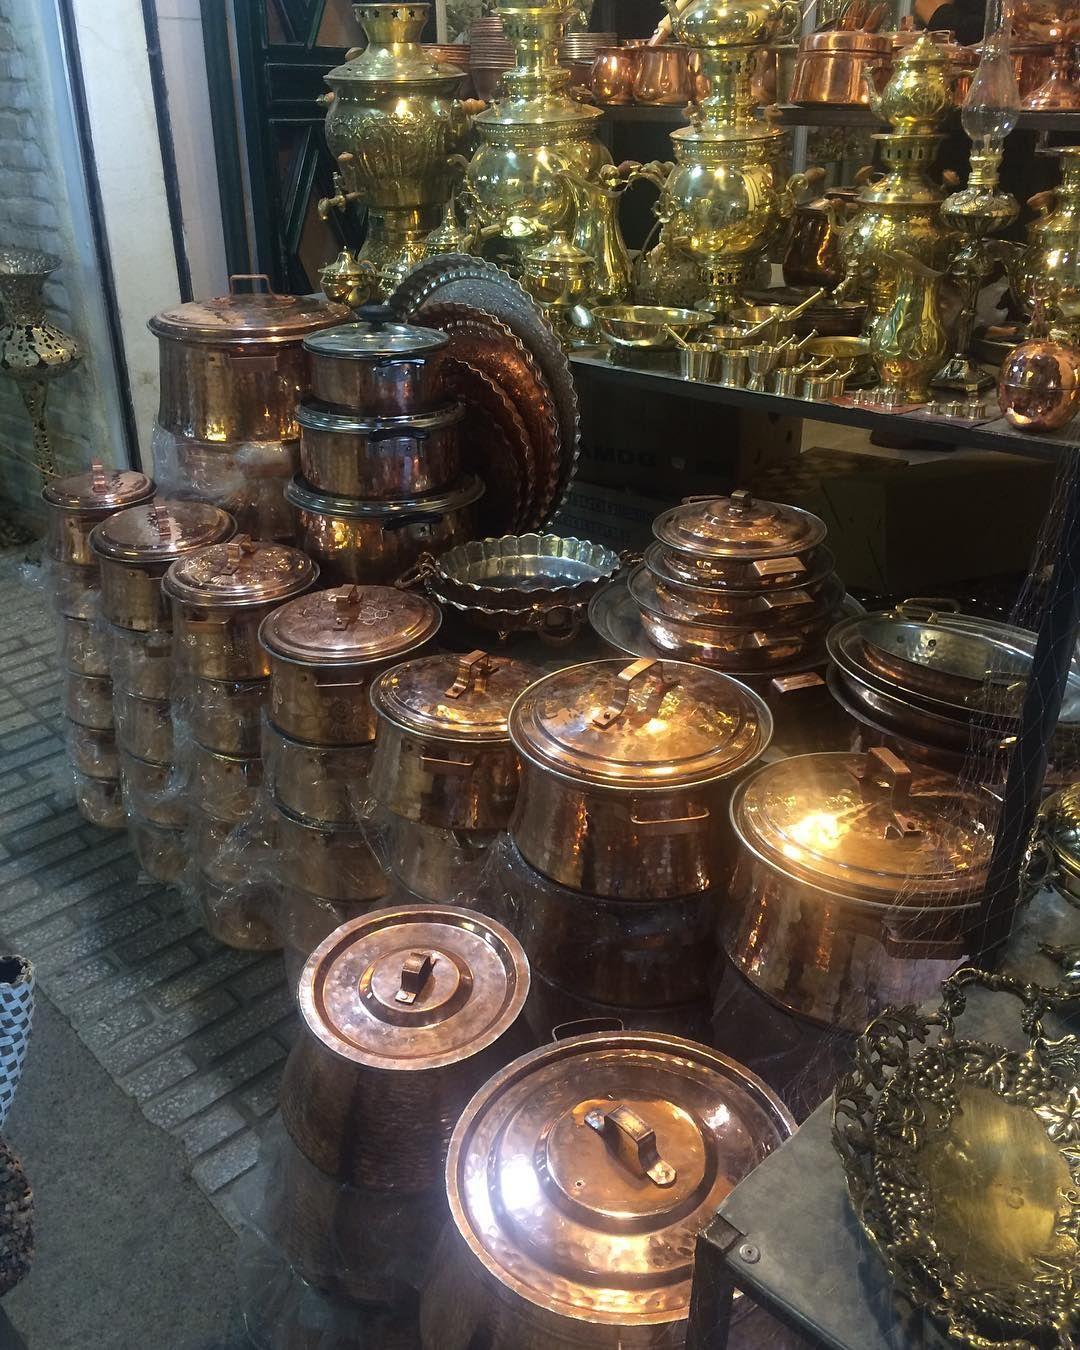 Coopersmith Pots at the Tarikeh Bazaar in Kirmaşan City, Iran.